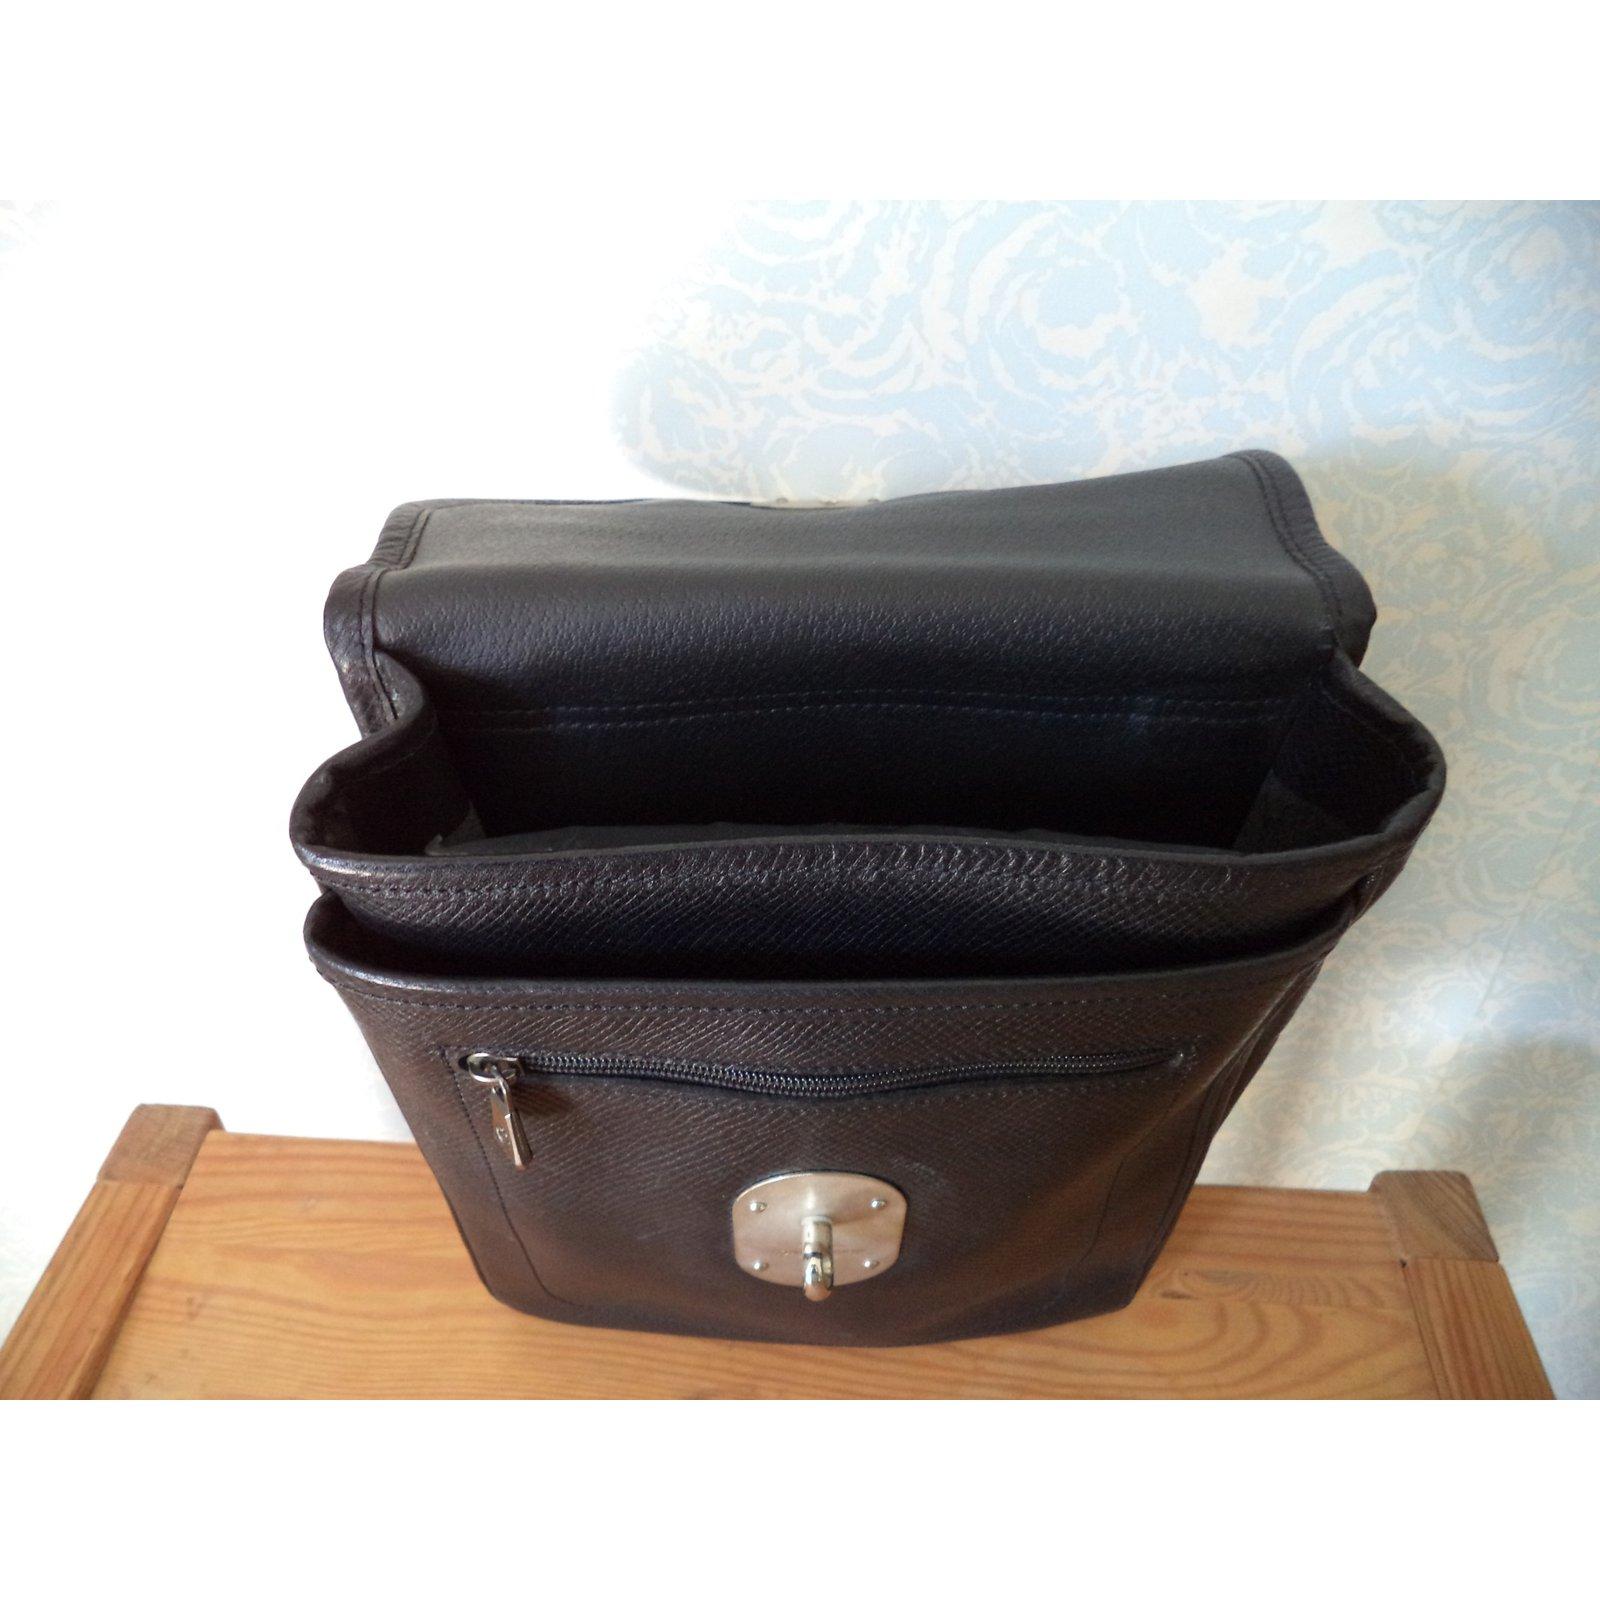 petite maroquinerie homme longchamp sacoche cuir cuir noir joli closet. Black Bedroom Furniture Sets. Home Design Ideas